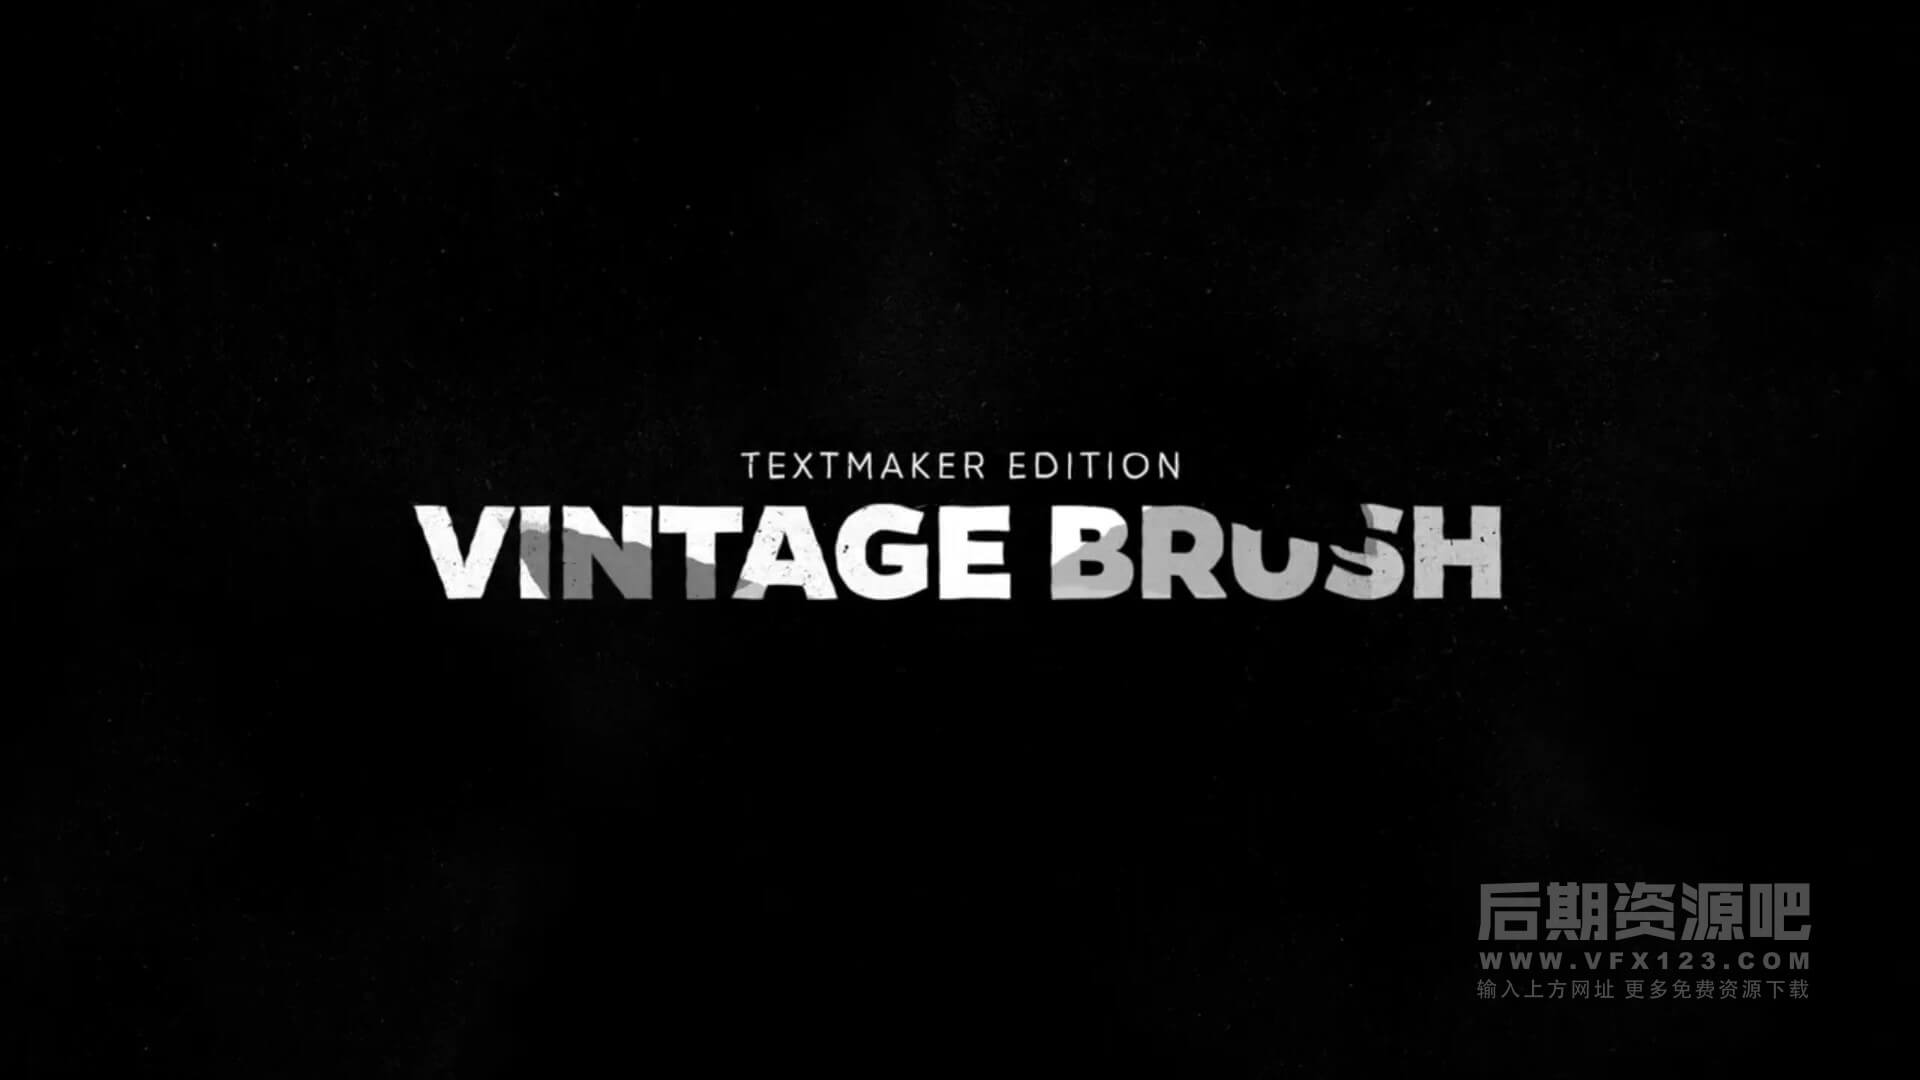 fcpx标题插件 8组复古笔刷文字动画效果模板 Titles Animator Vintage Brush